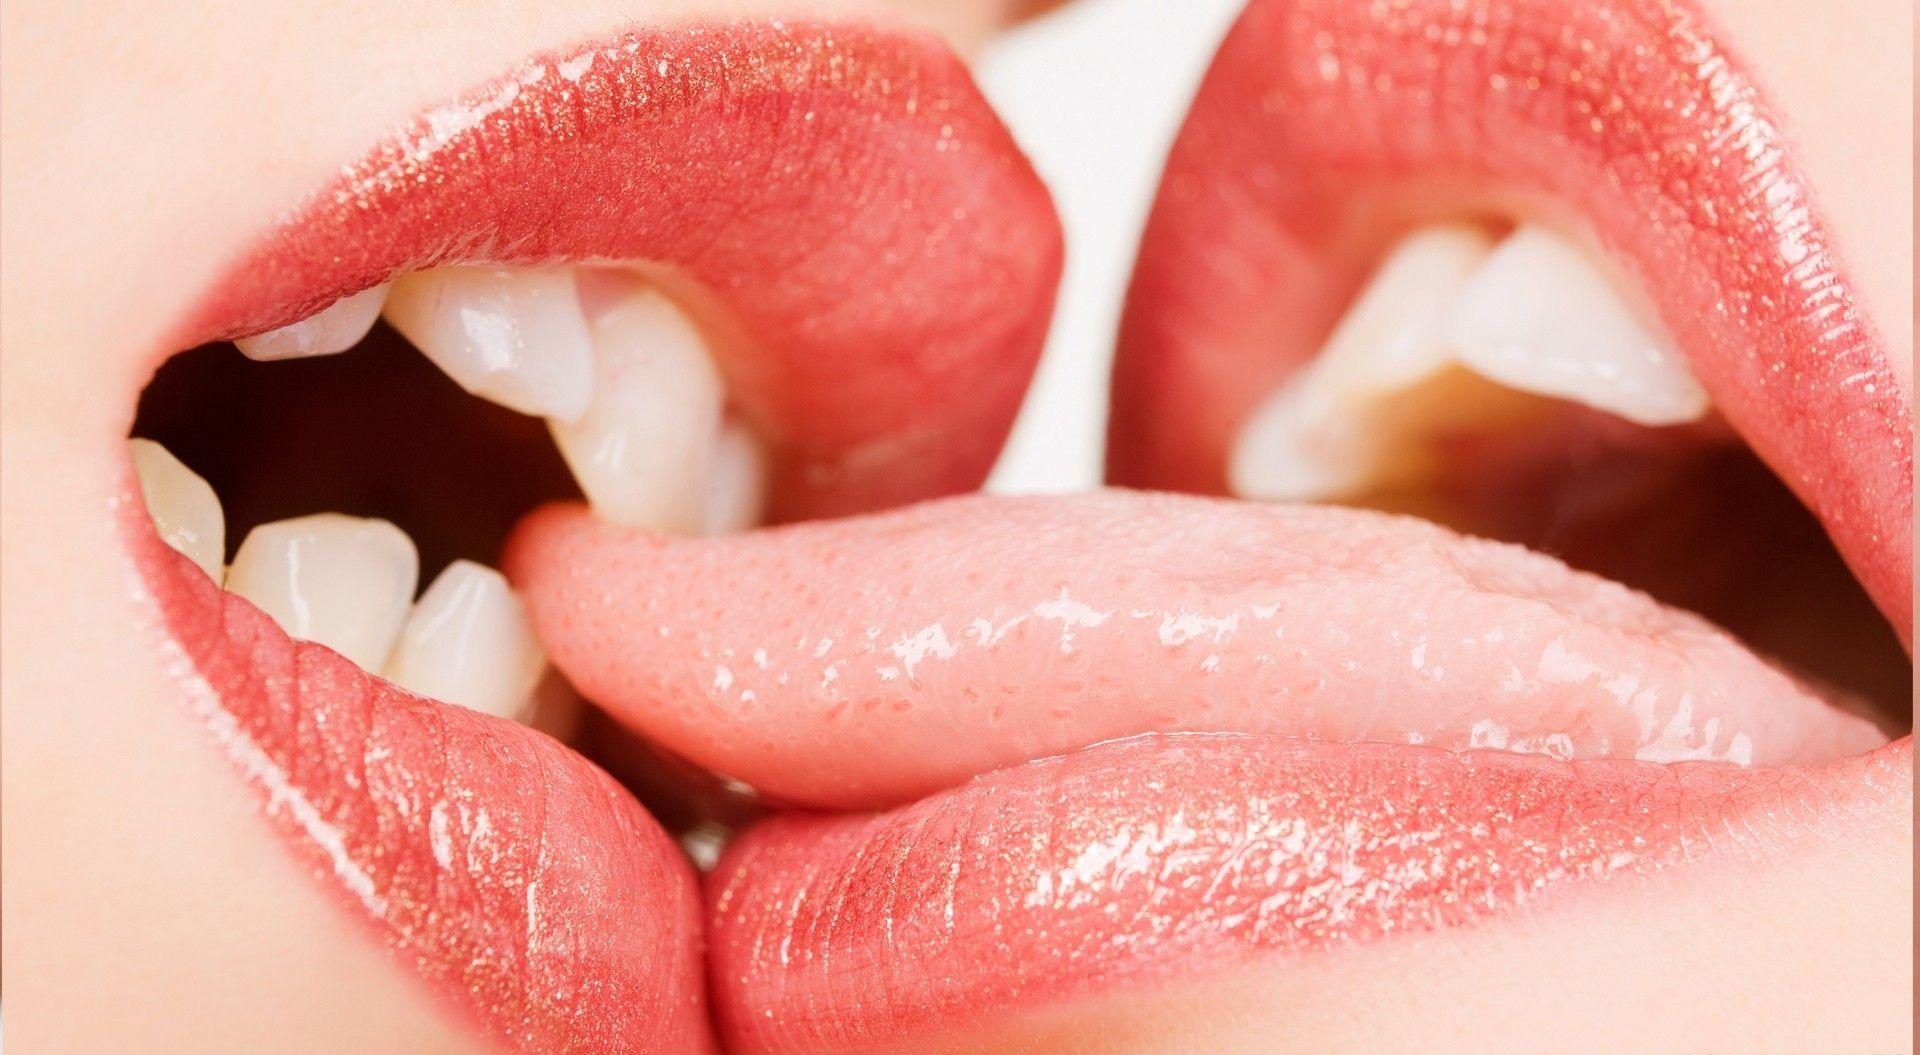 lip kiss   Lip kiss pic, Tongue kissing ...